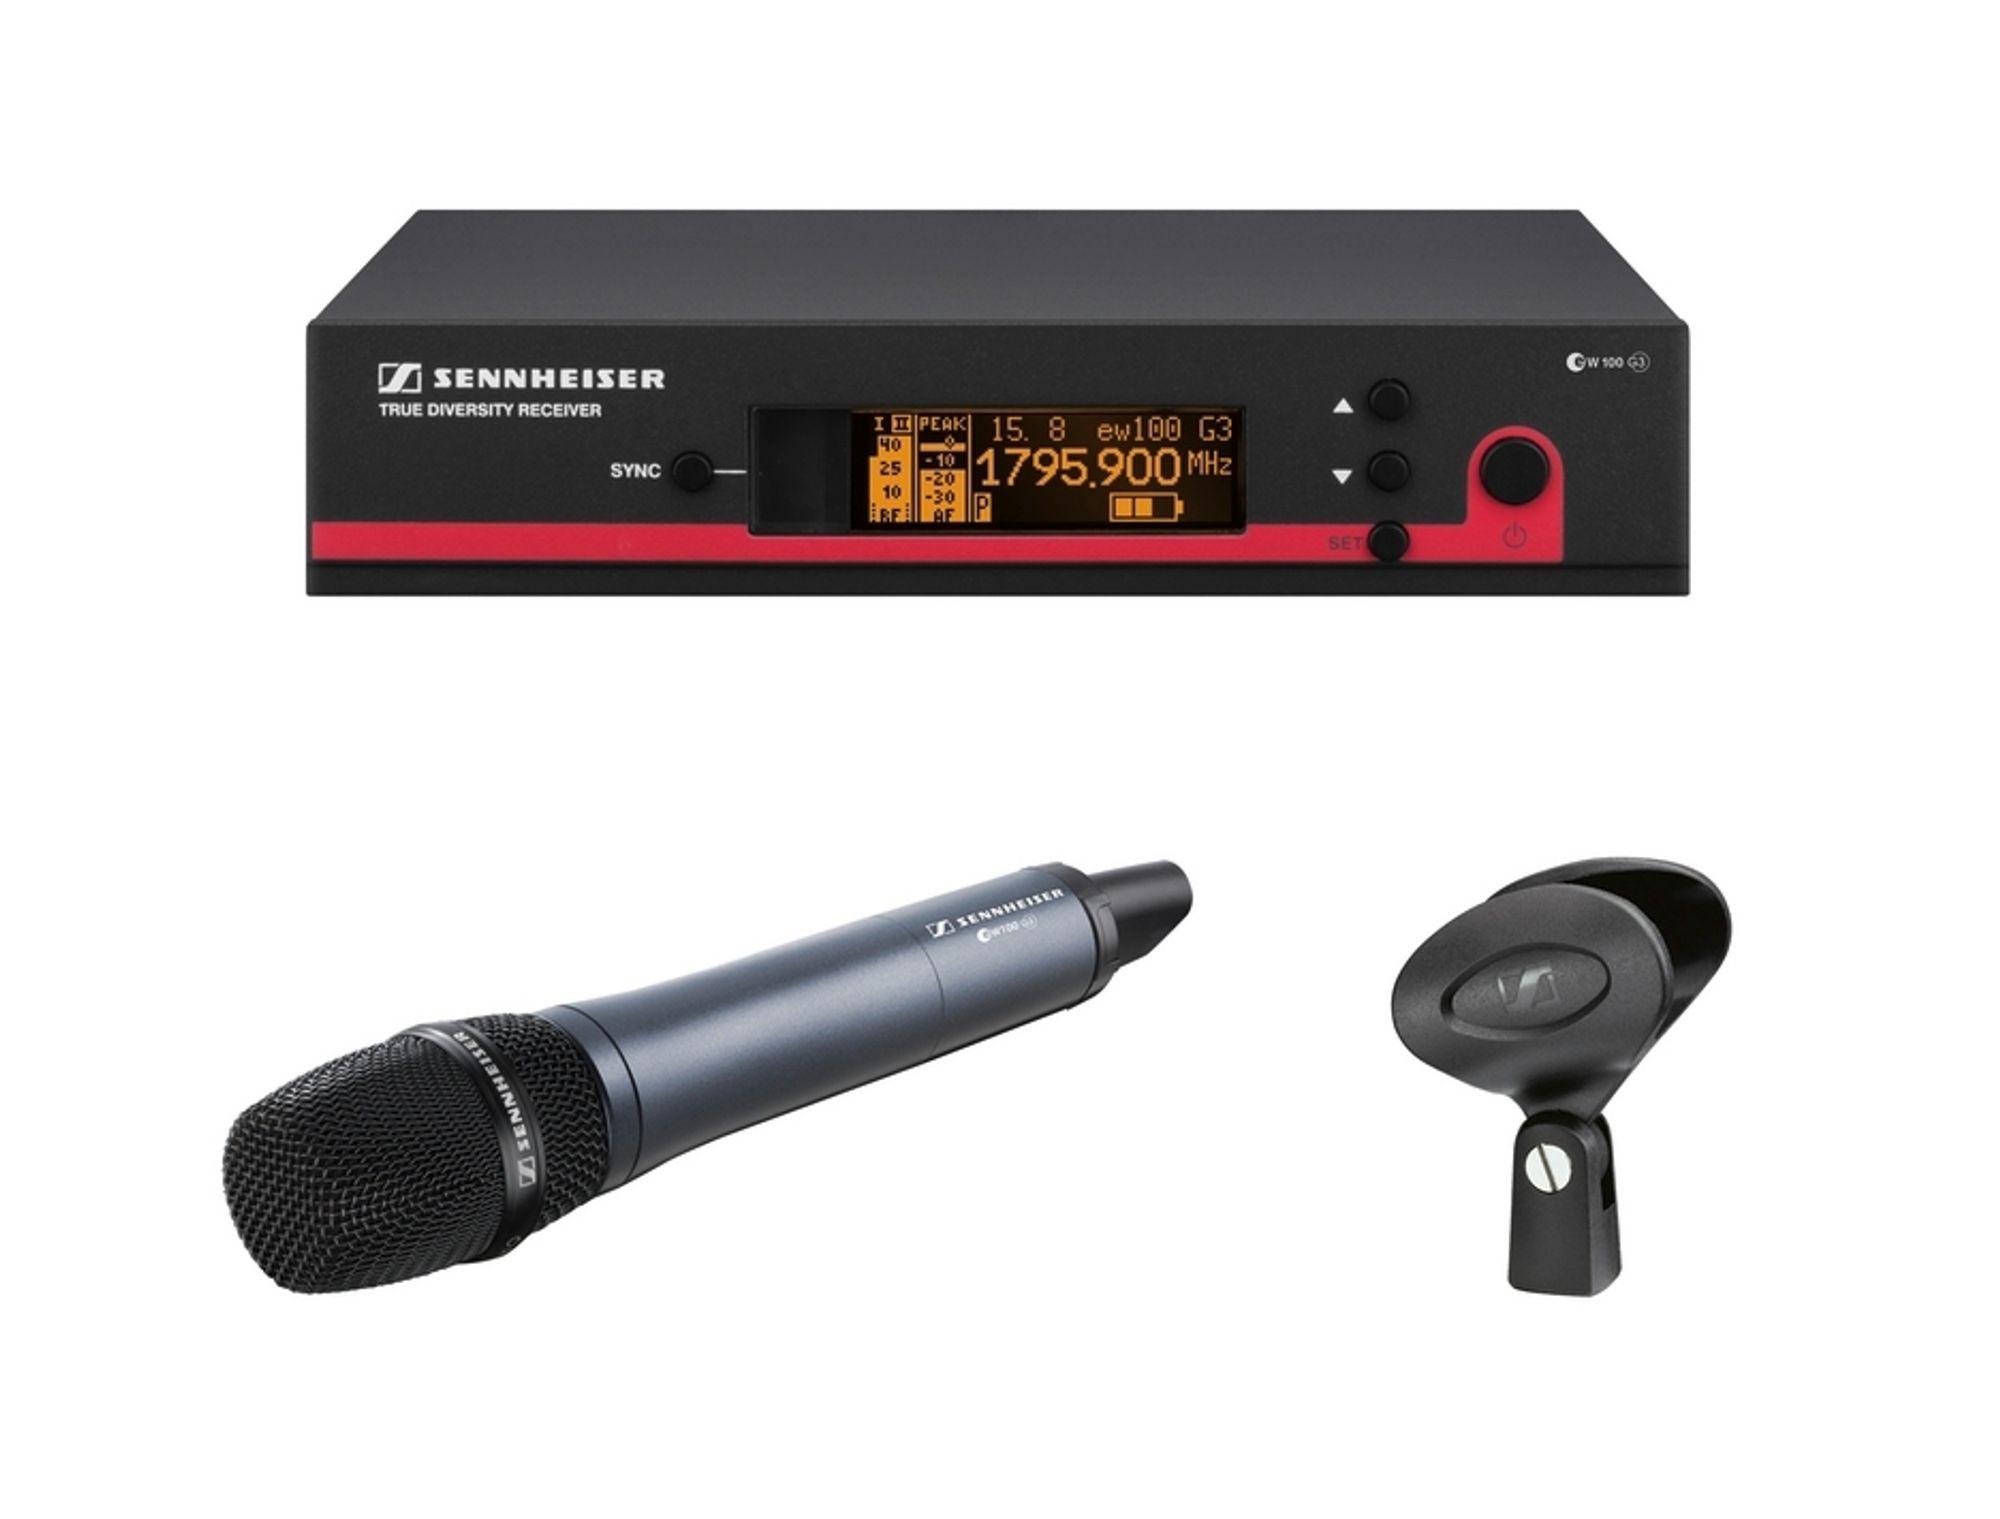 Trådløse mikrofonsystemer